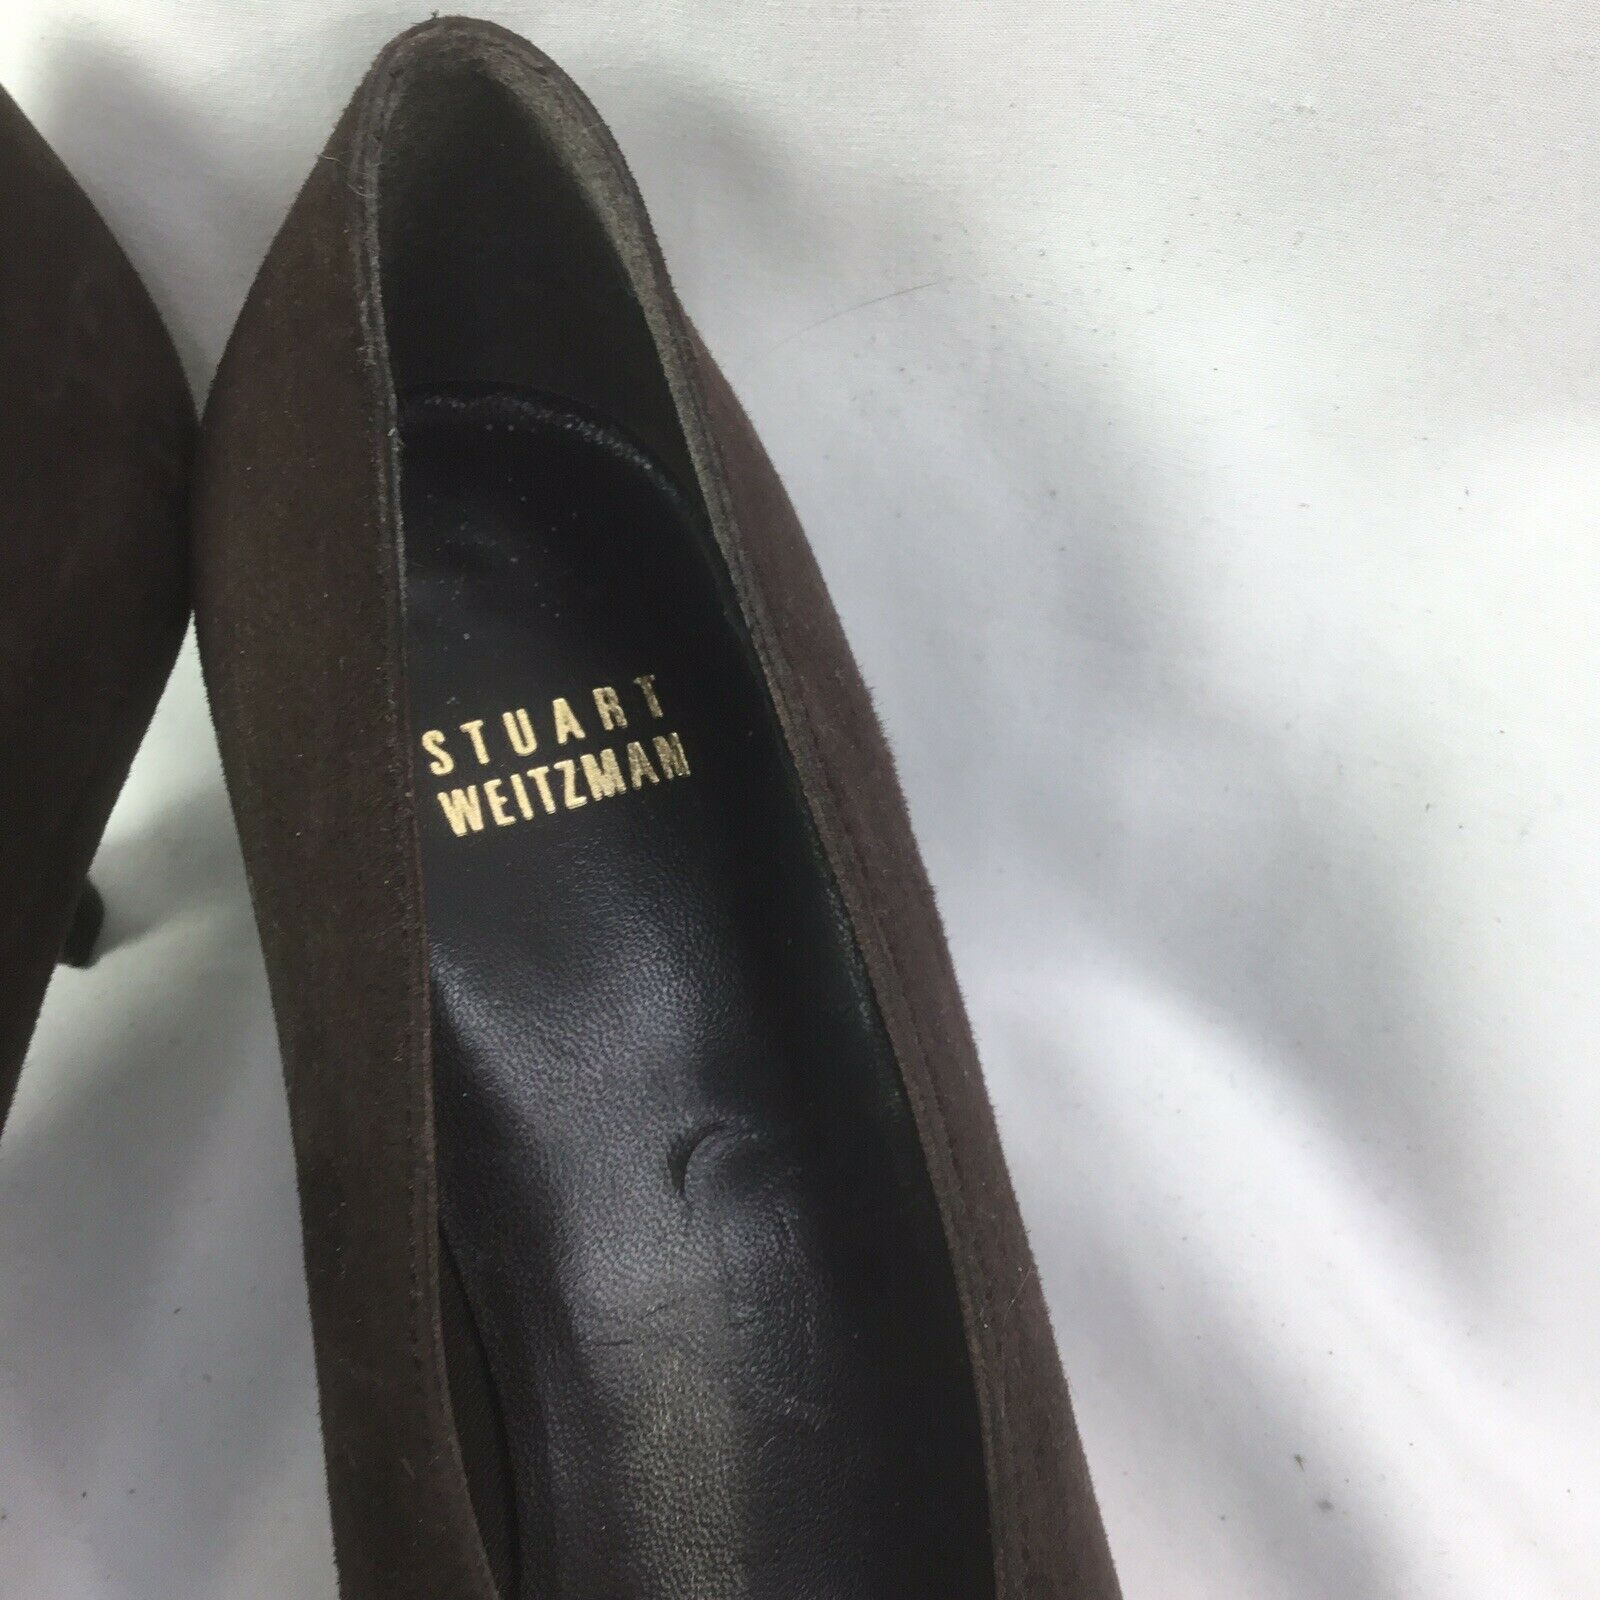 Stuart Weitzman Bombas de ante marrón para mujer Talla 7 M M 7 a320bf